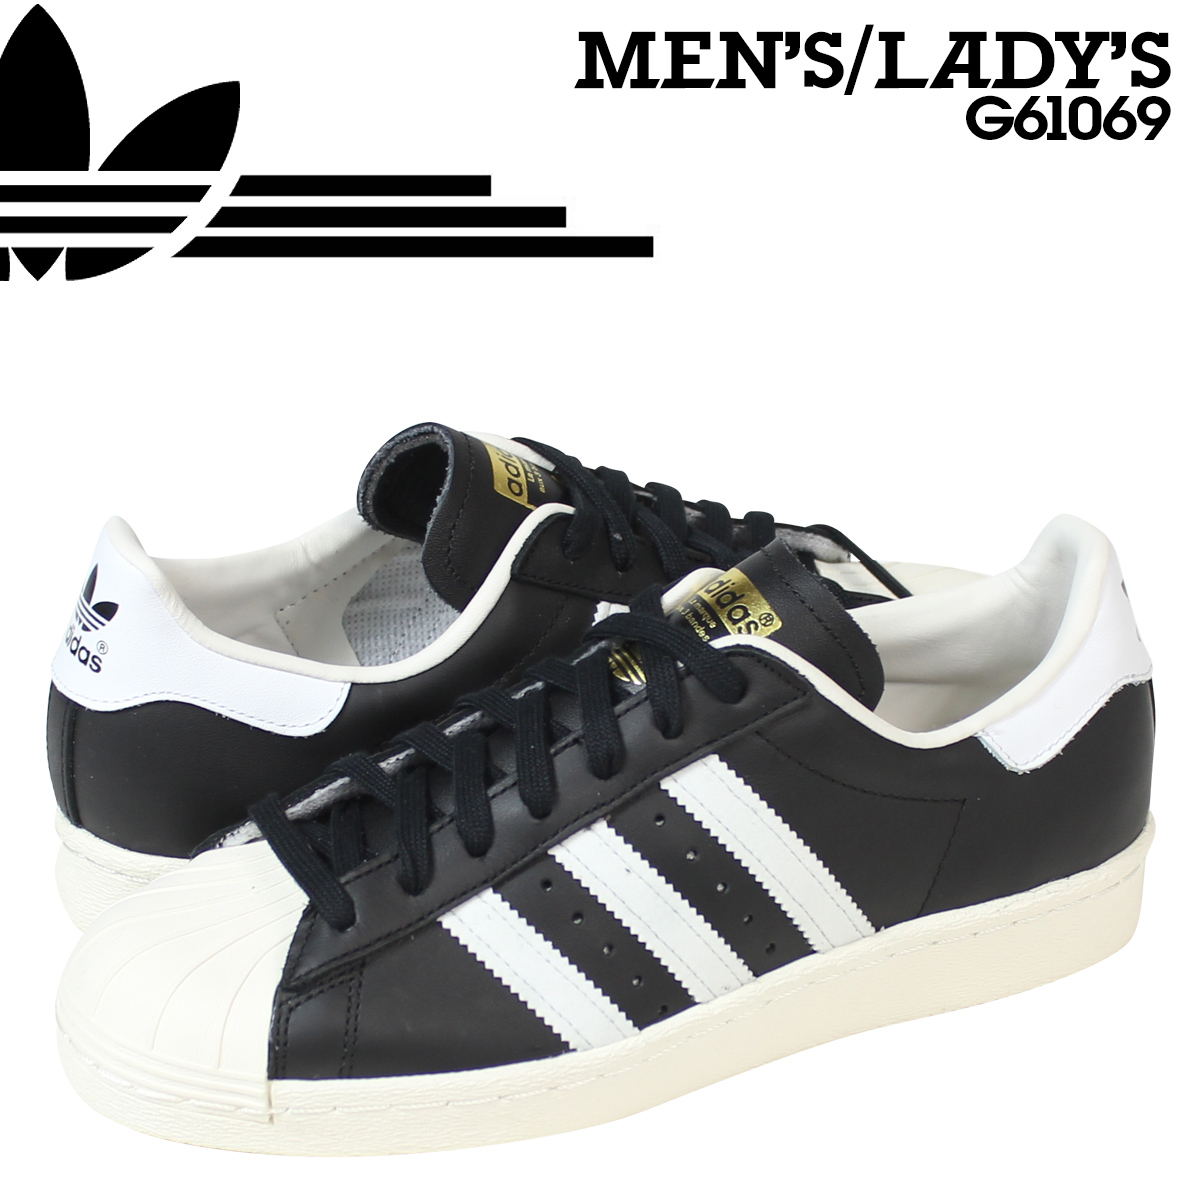 27e9830a Whats up Sports: adidas Originals adidas originals superstar sneakers  SUPERSTAR 80 s G61069 men's women's shoes black [8/5 Add in stock] |  Rakuten Global ...